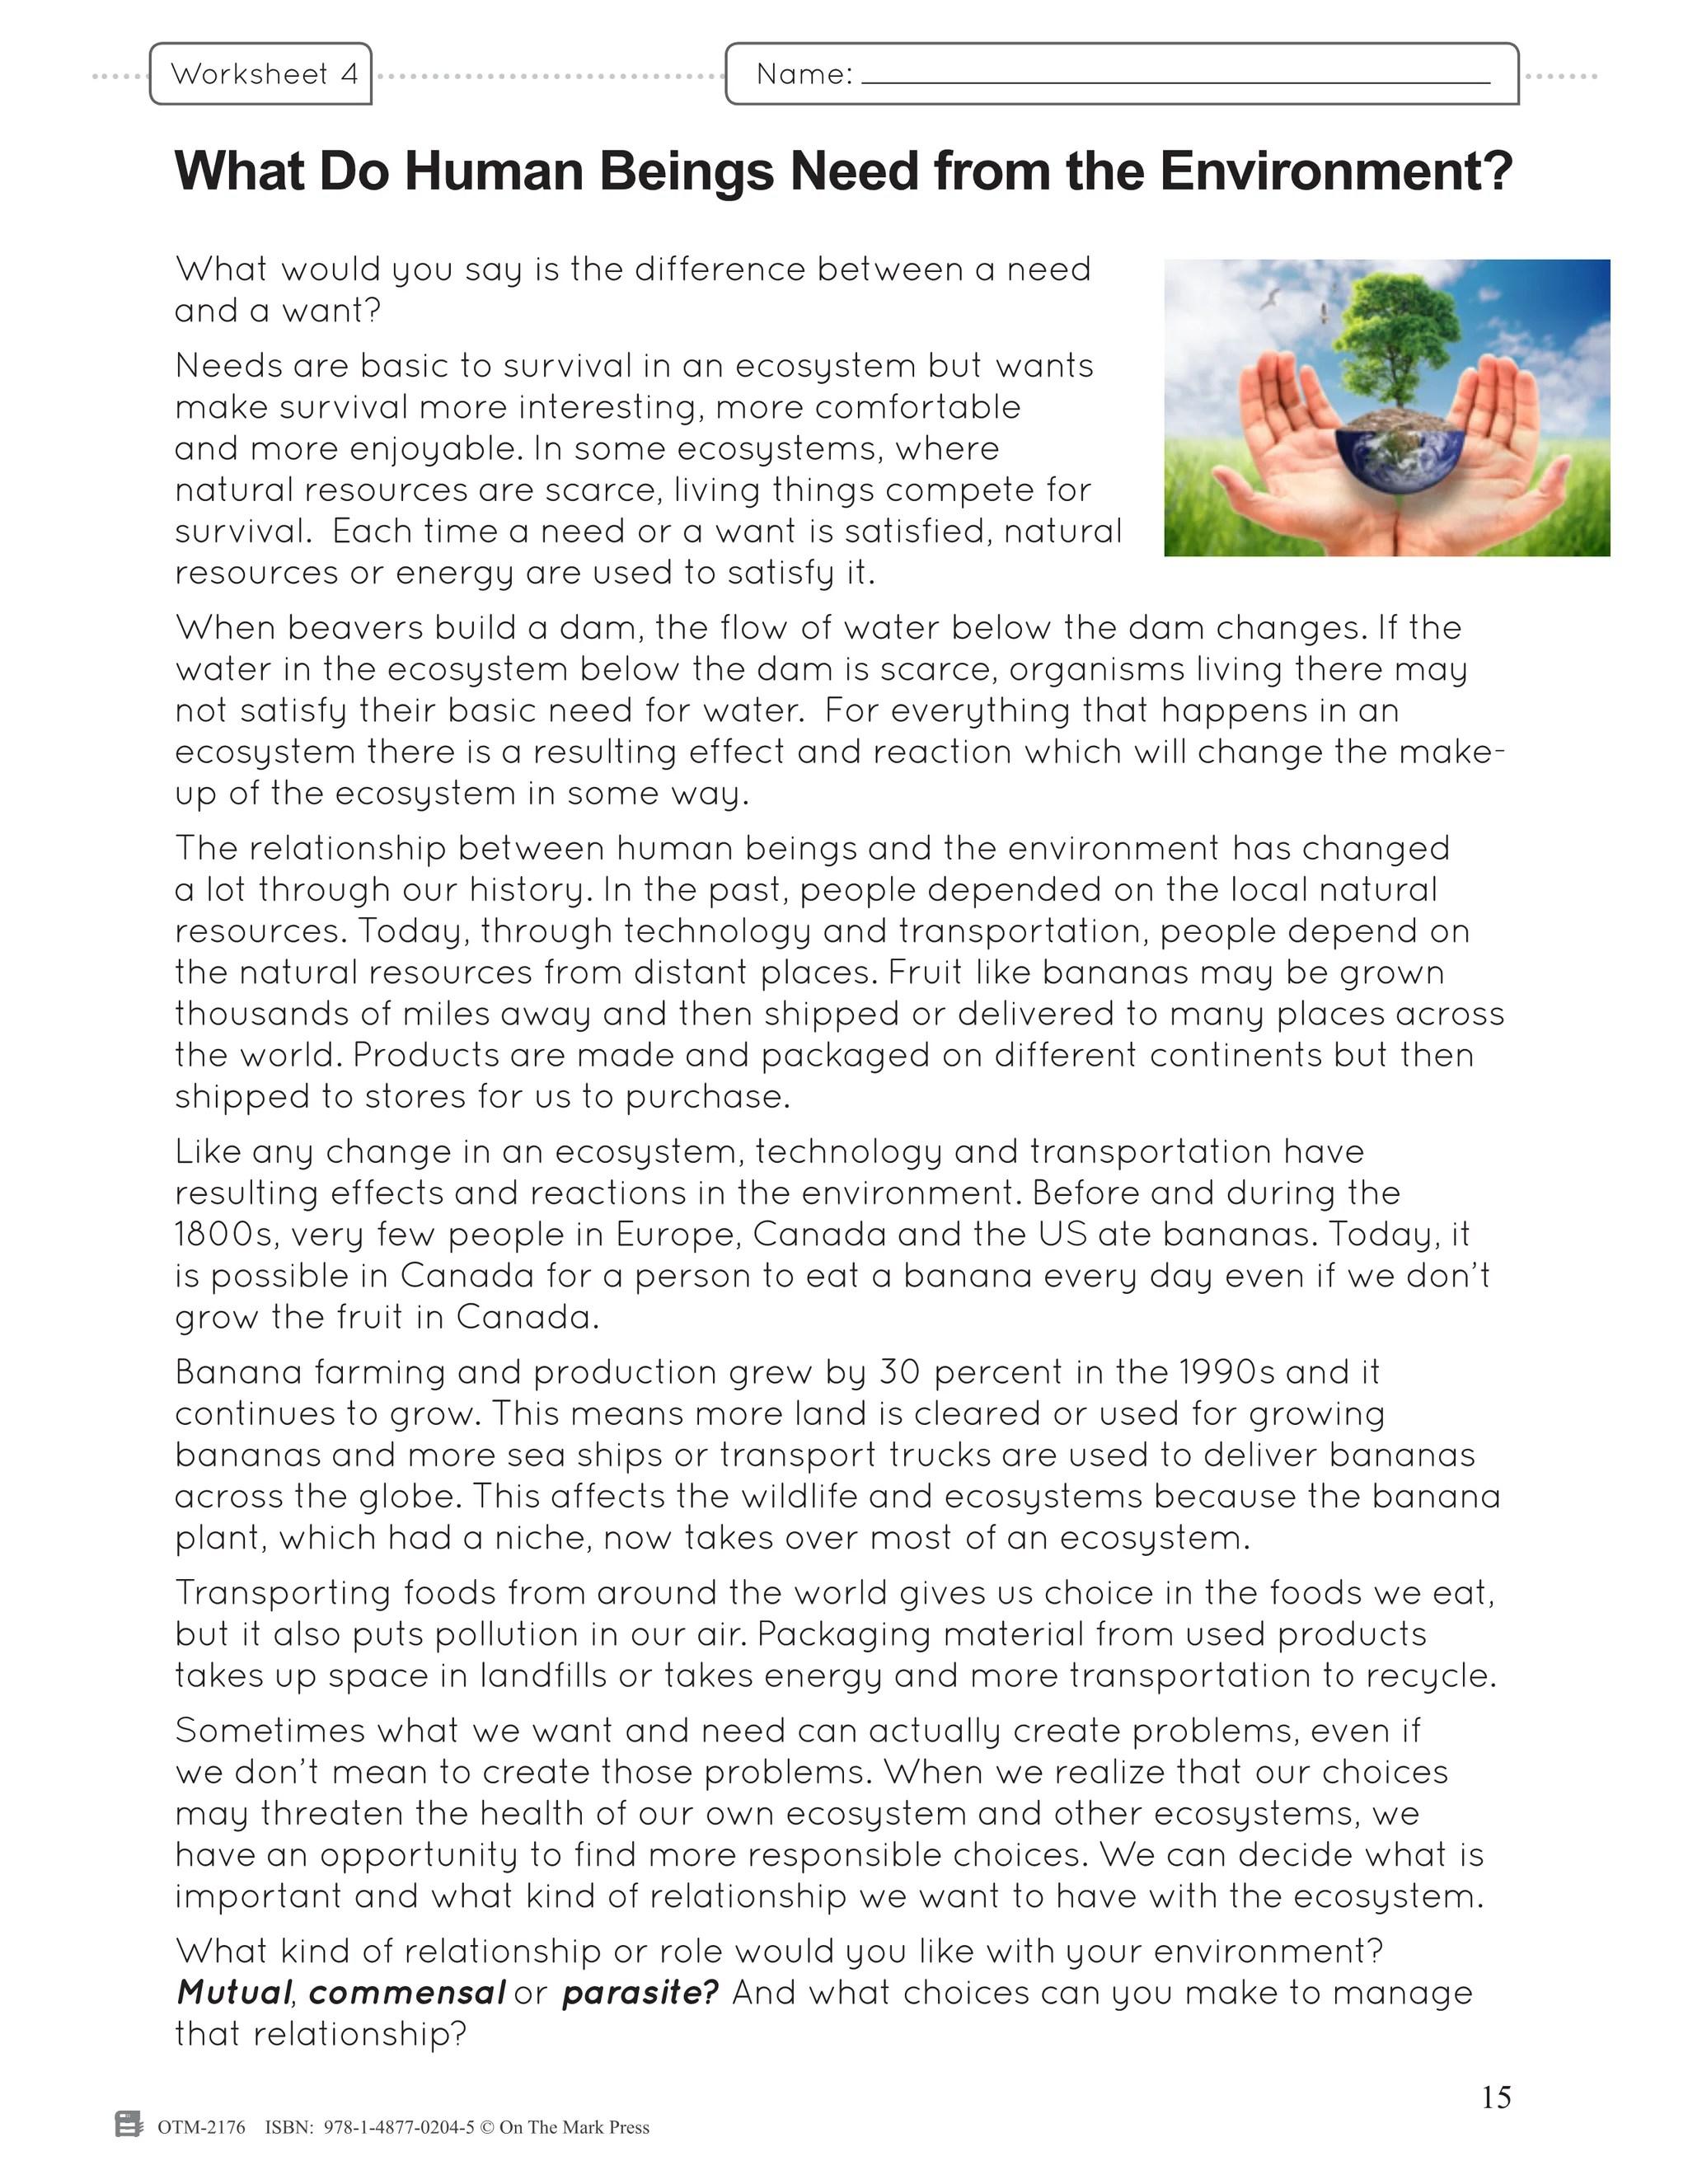 hight resolution of Alberta Grade 7 Science Curriculum - On The Mark Press